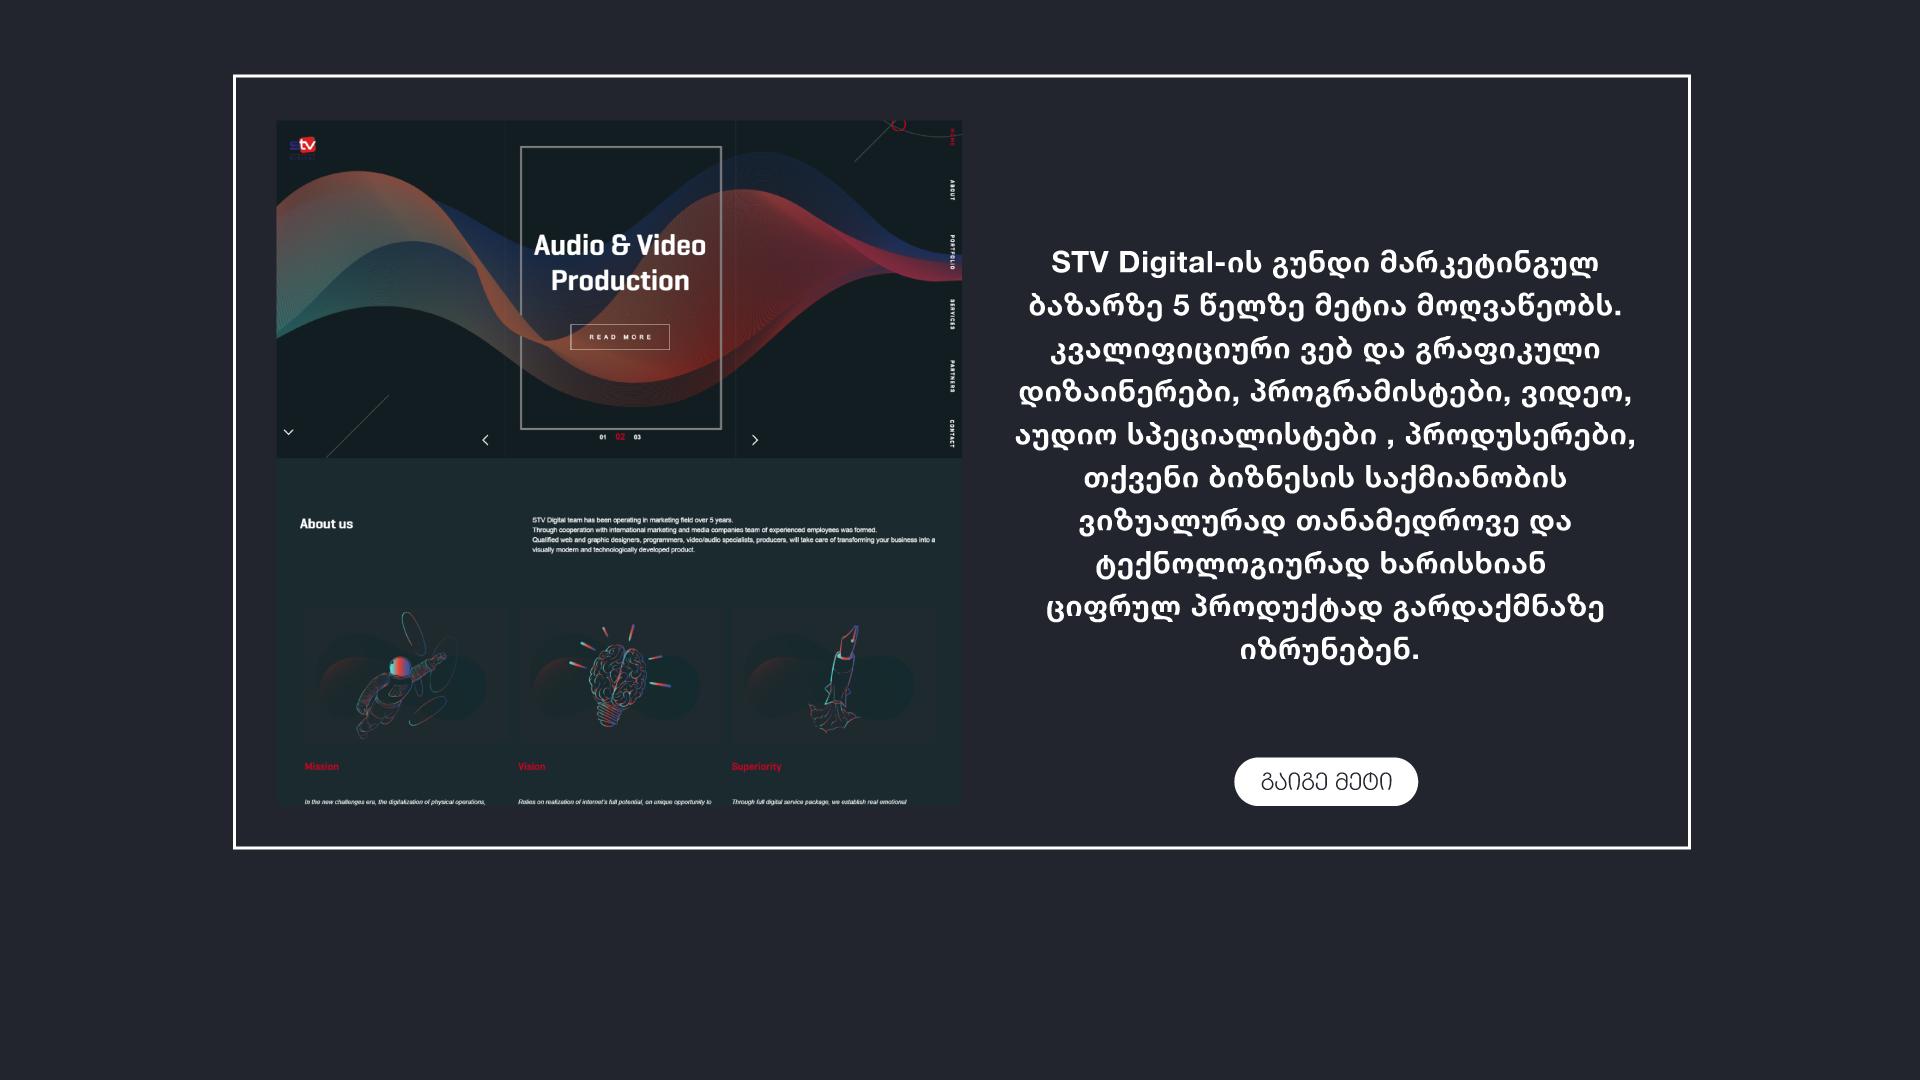 STV Digital